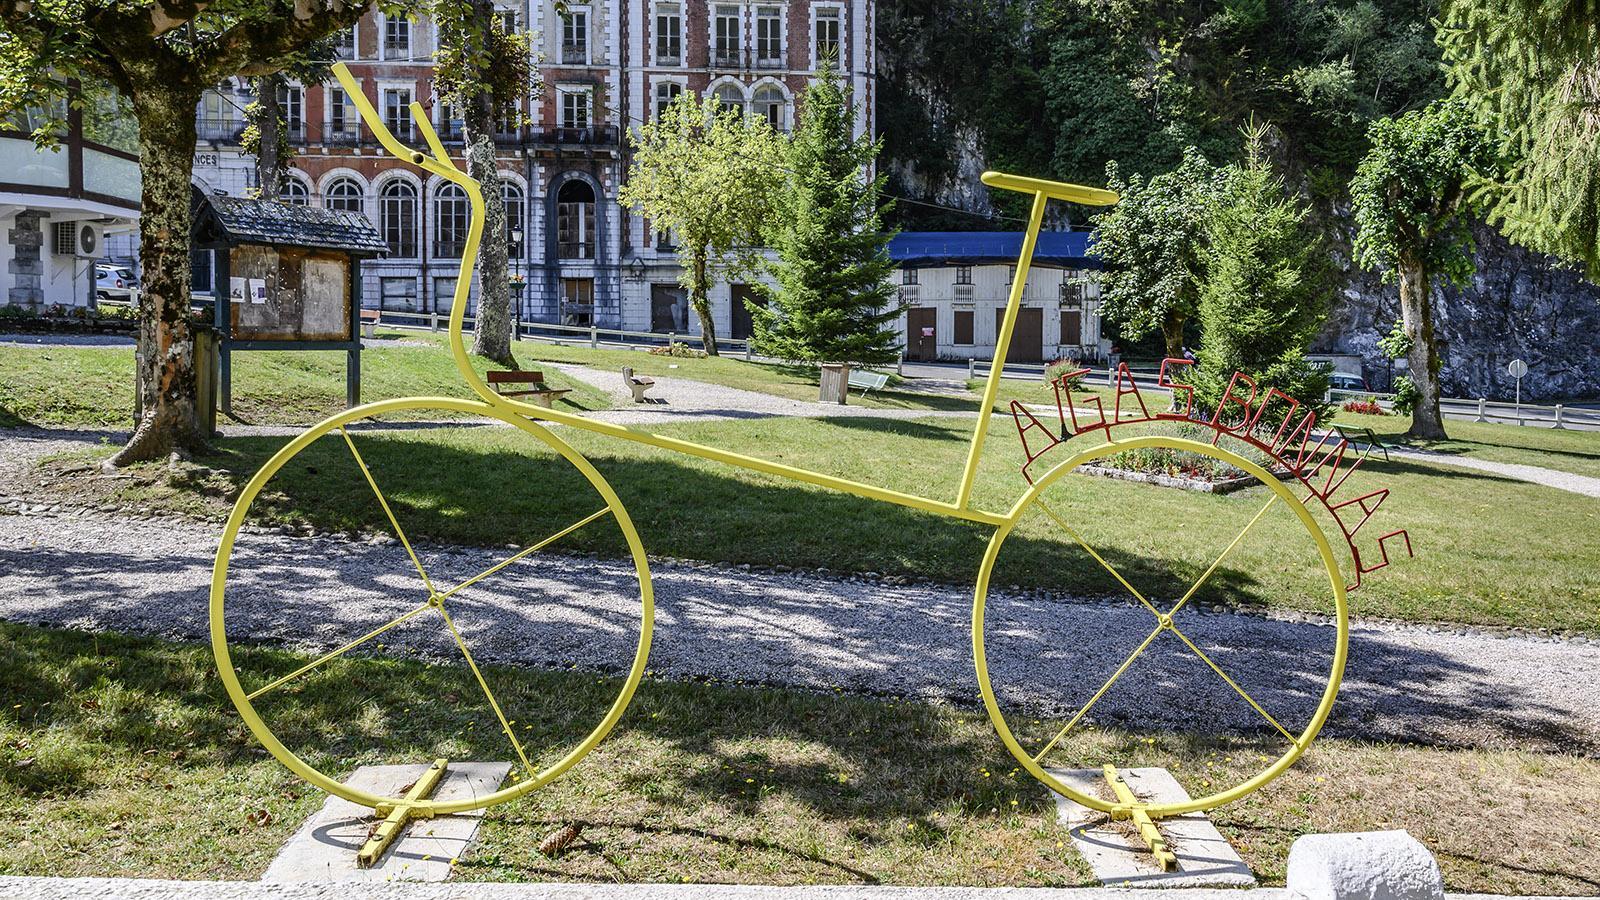 An der Promenade erinnert dieses Rad in XXL daran, dass Eaux-Bonnes 2007 und 2010 Etappenort der Tour de France war. Foto: Hilke Maunder